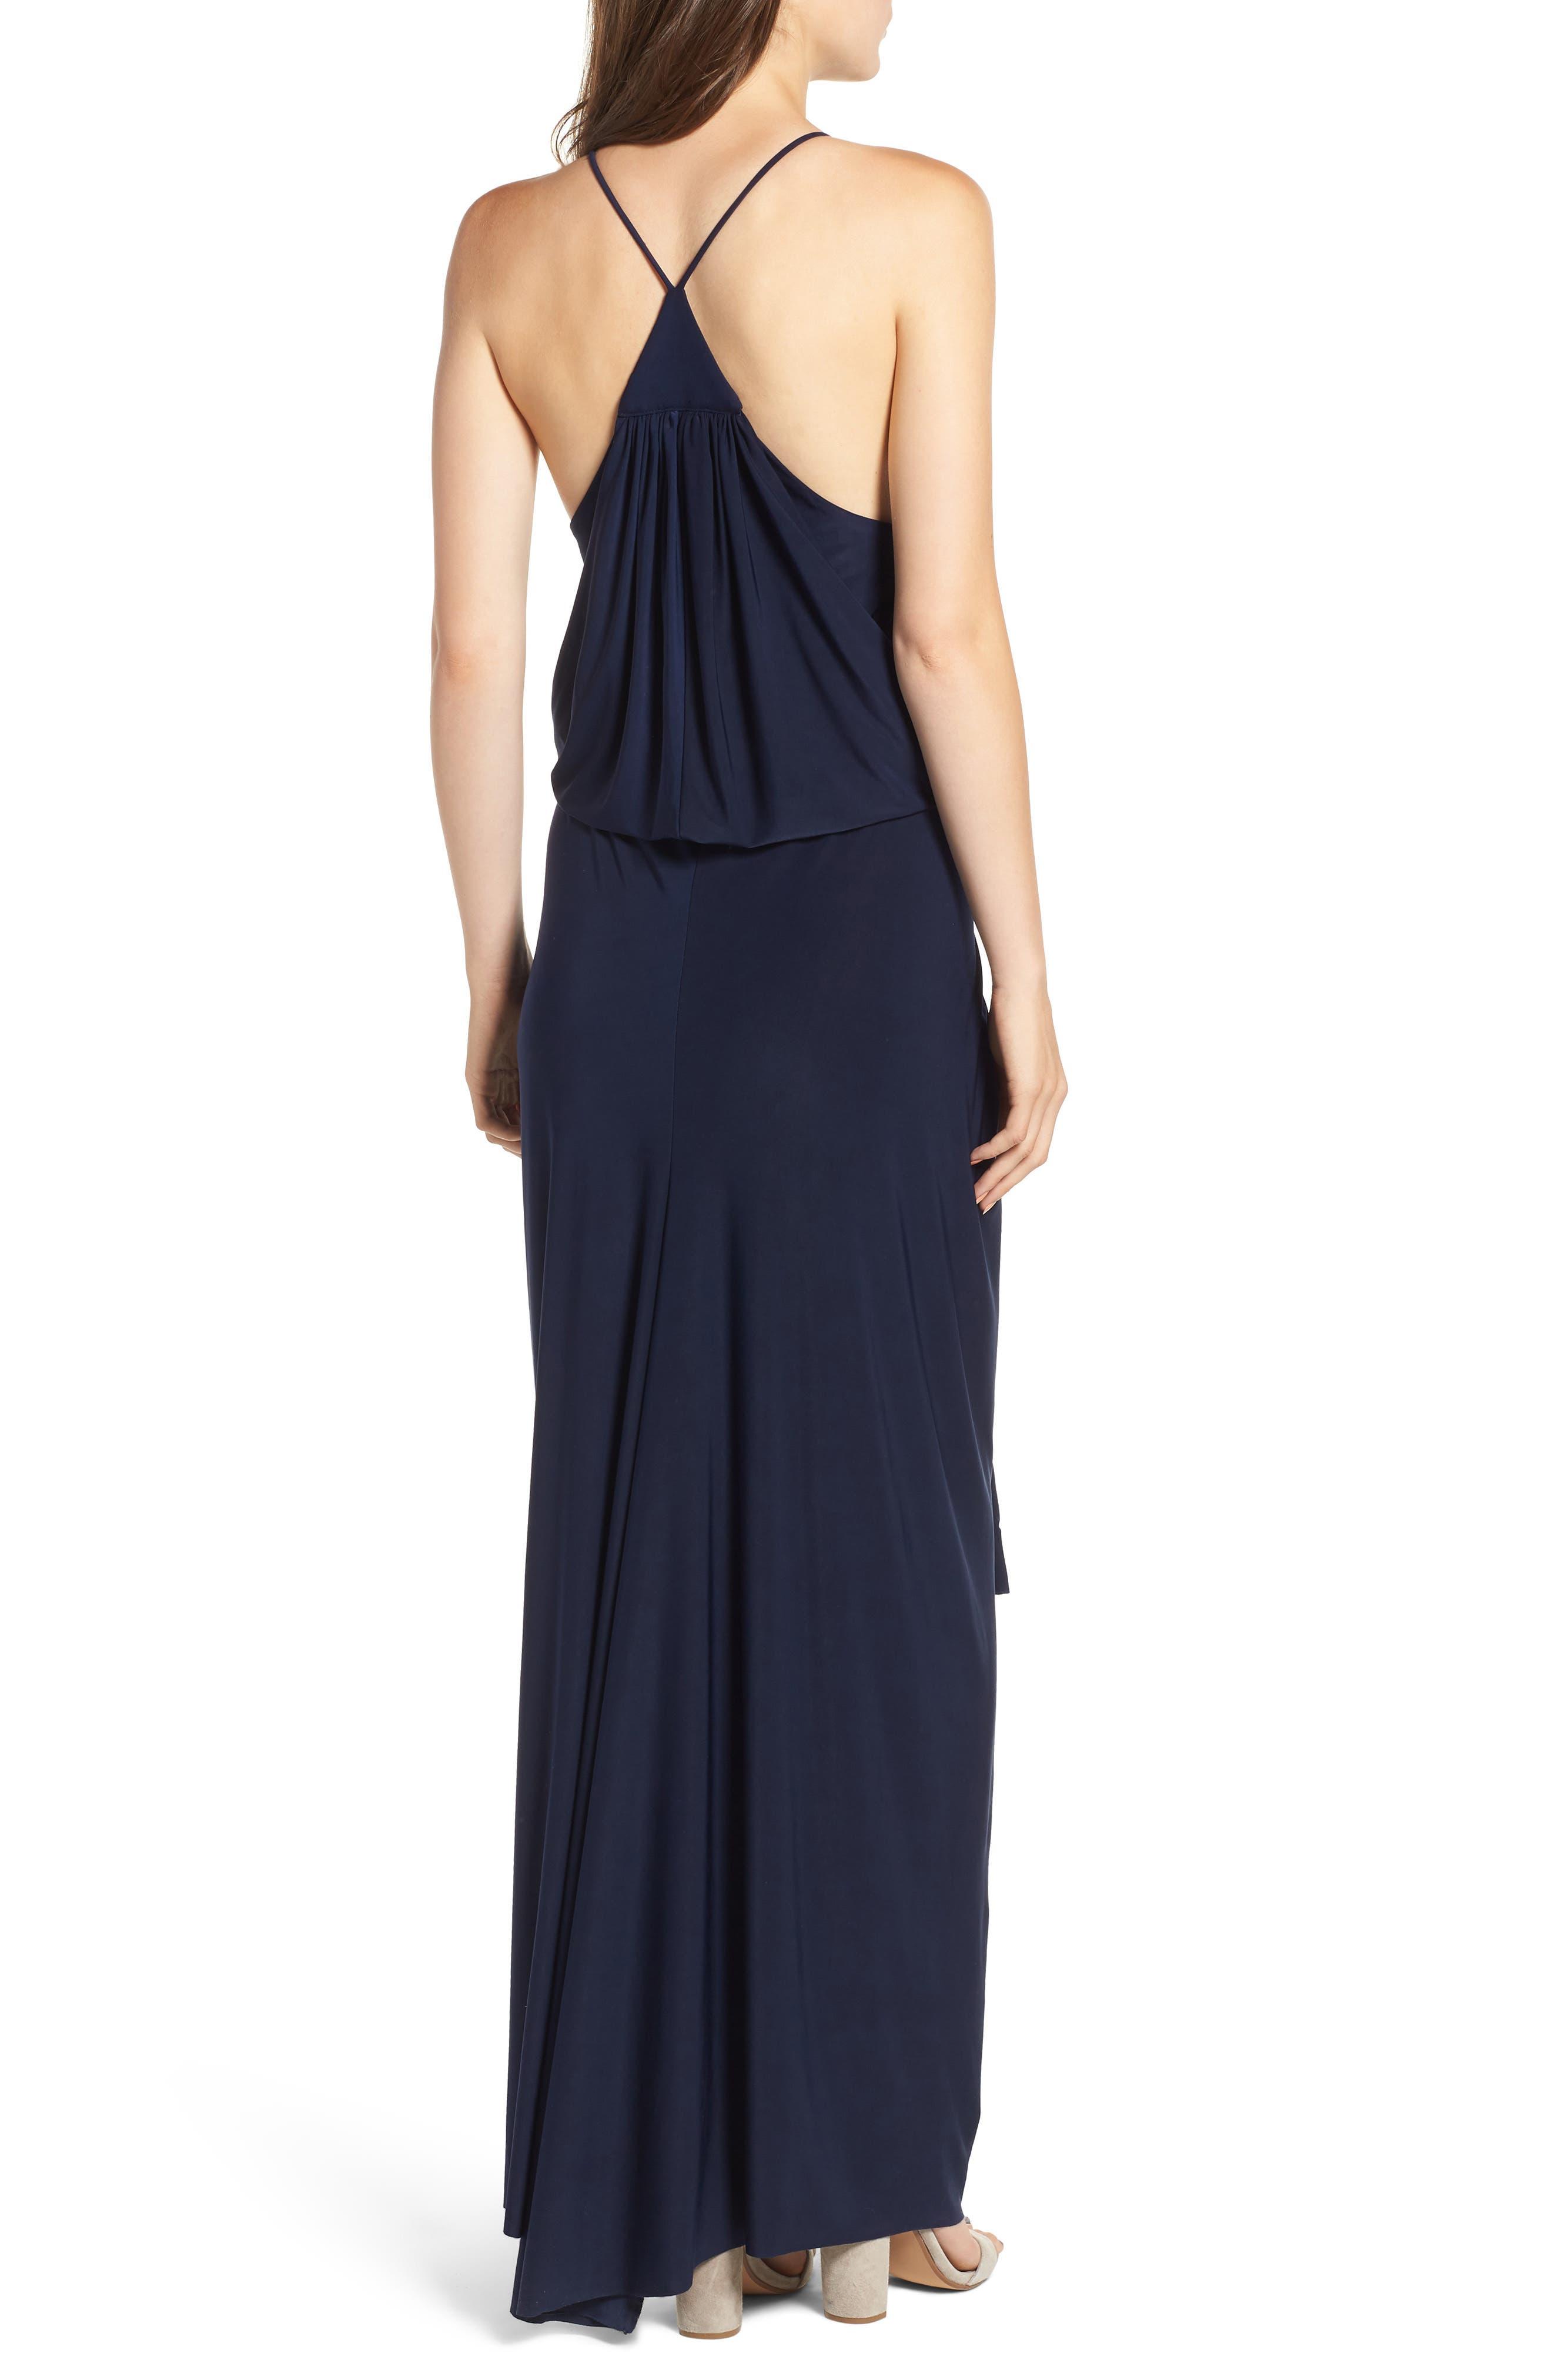 Domino Knot Maxi Dress,                             Alternate thumbnail 2, color,                             MIDNIGHT